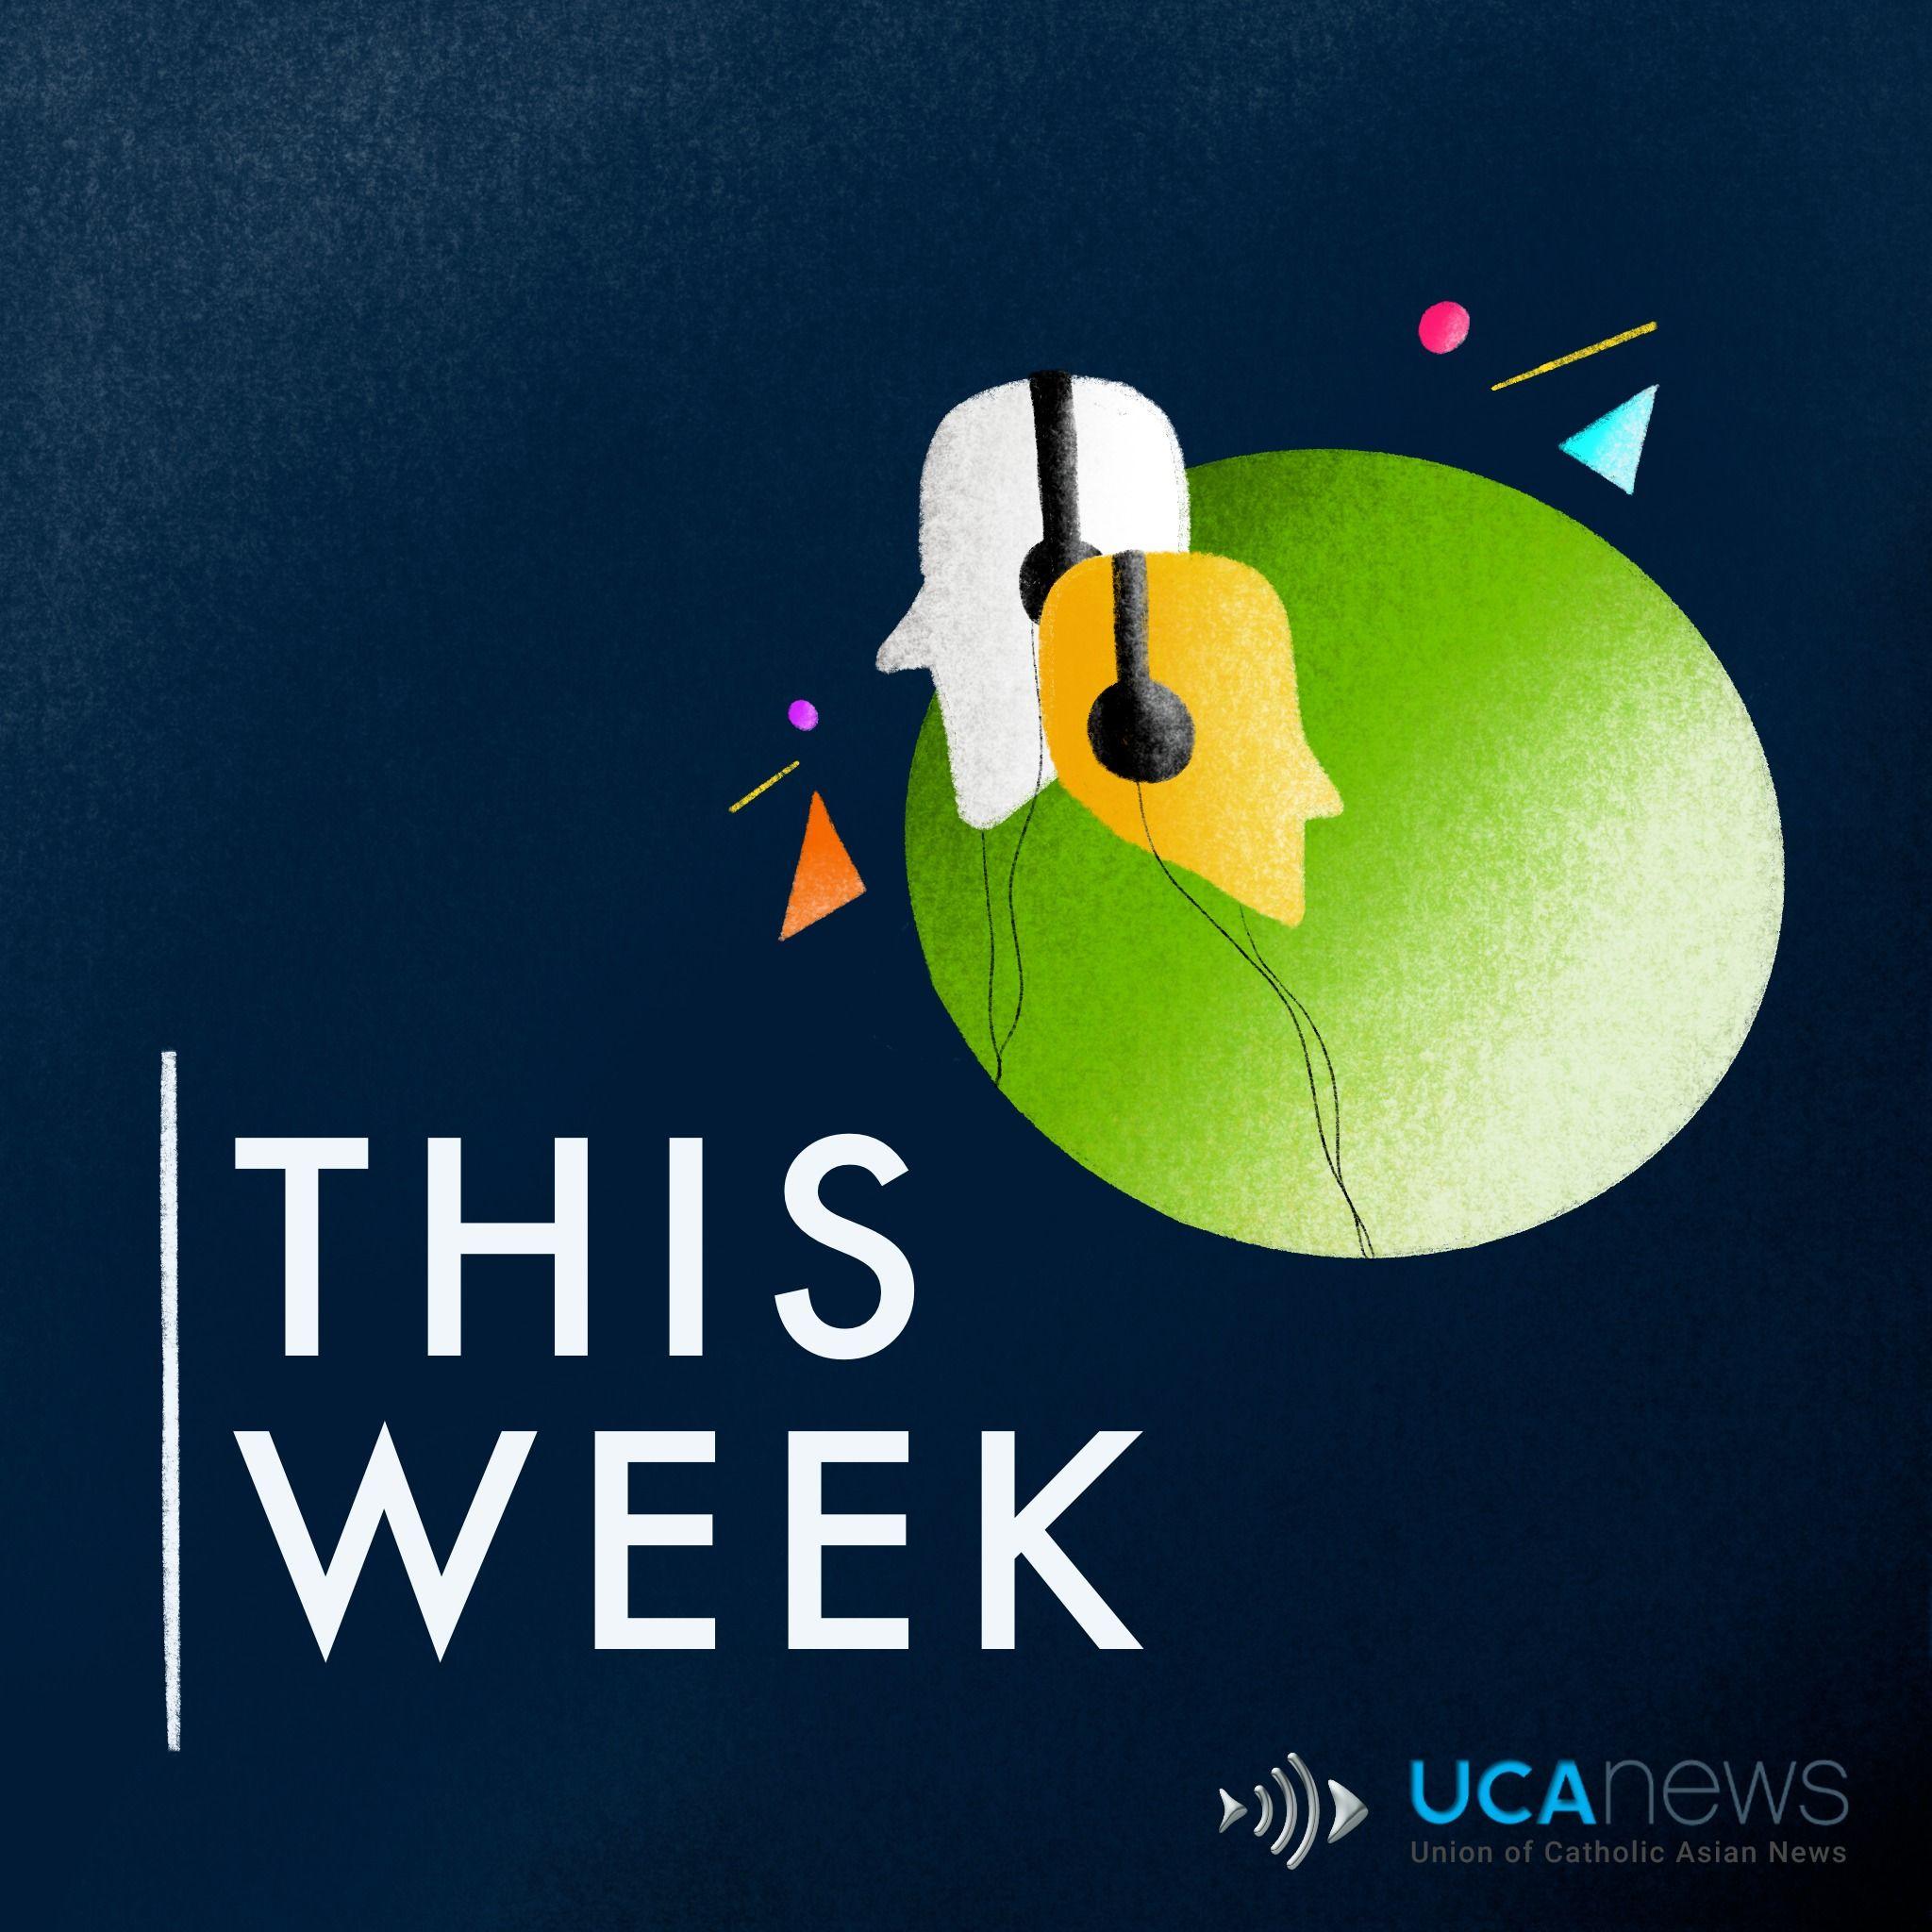 UCA News Weekly Summary, June 4, 2021